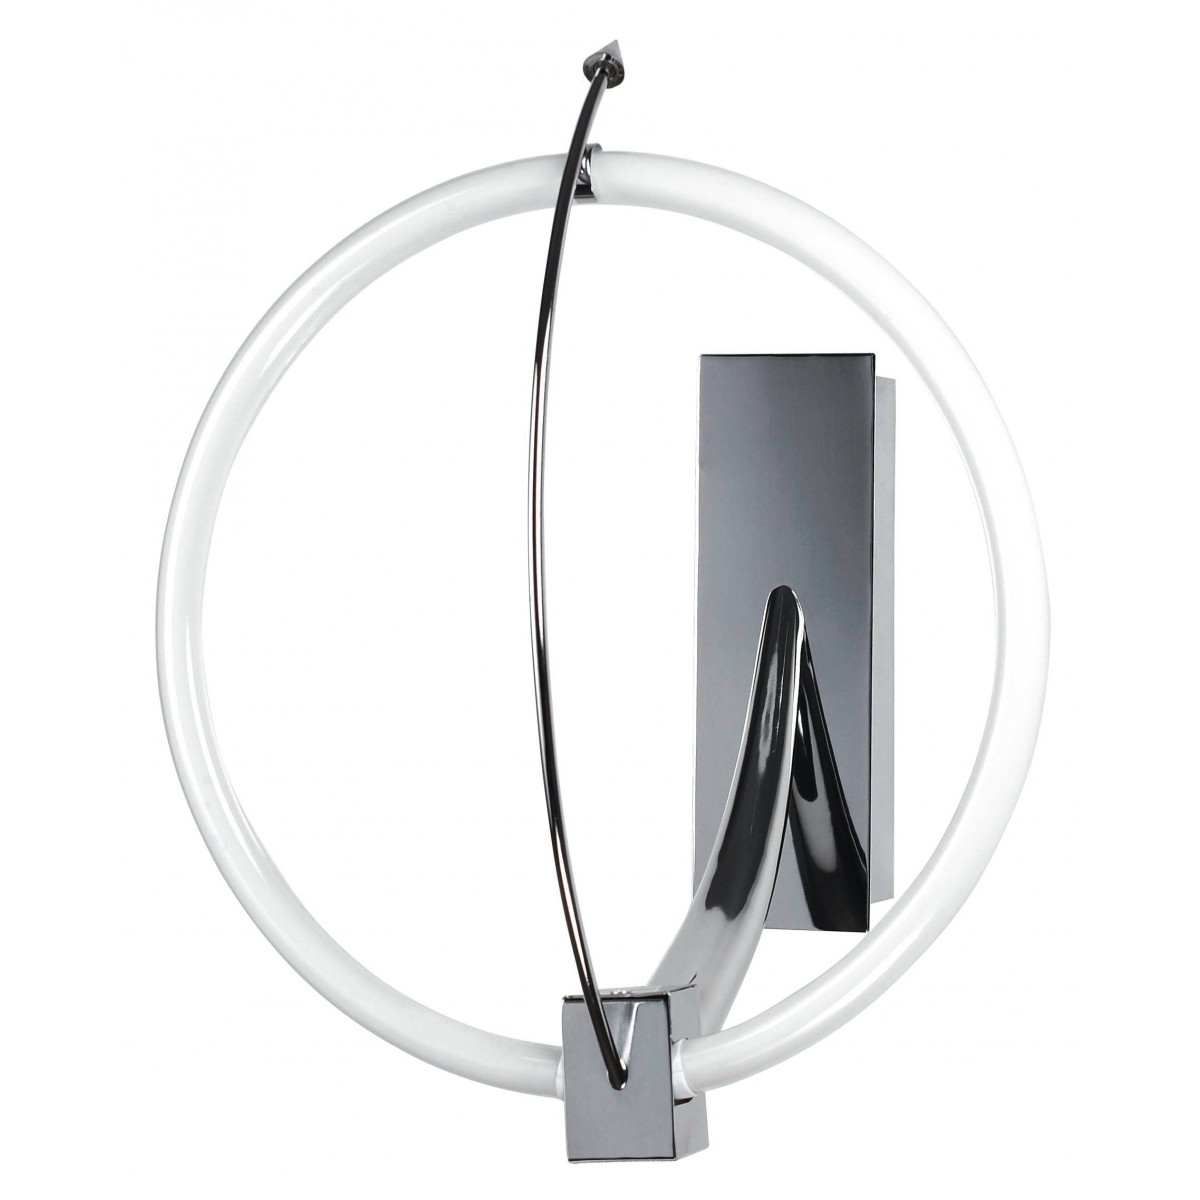 CERCHIO/AP - Applique Lampada Bagno Cerchio Metallo Cromo 55 watt T5 Luce Fredda